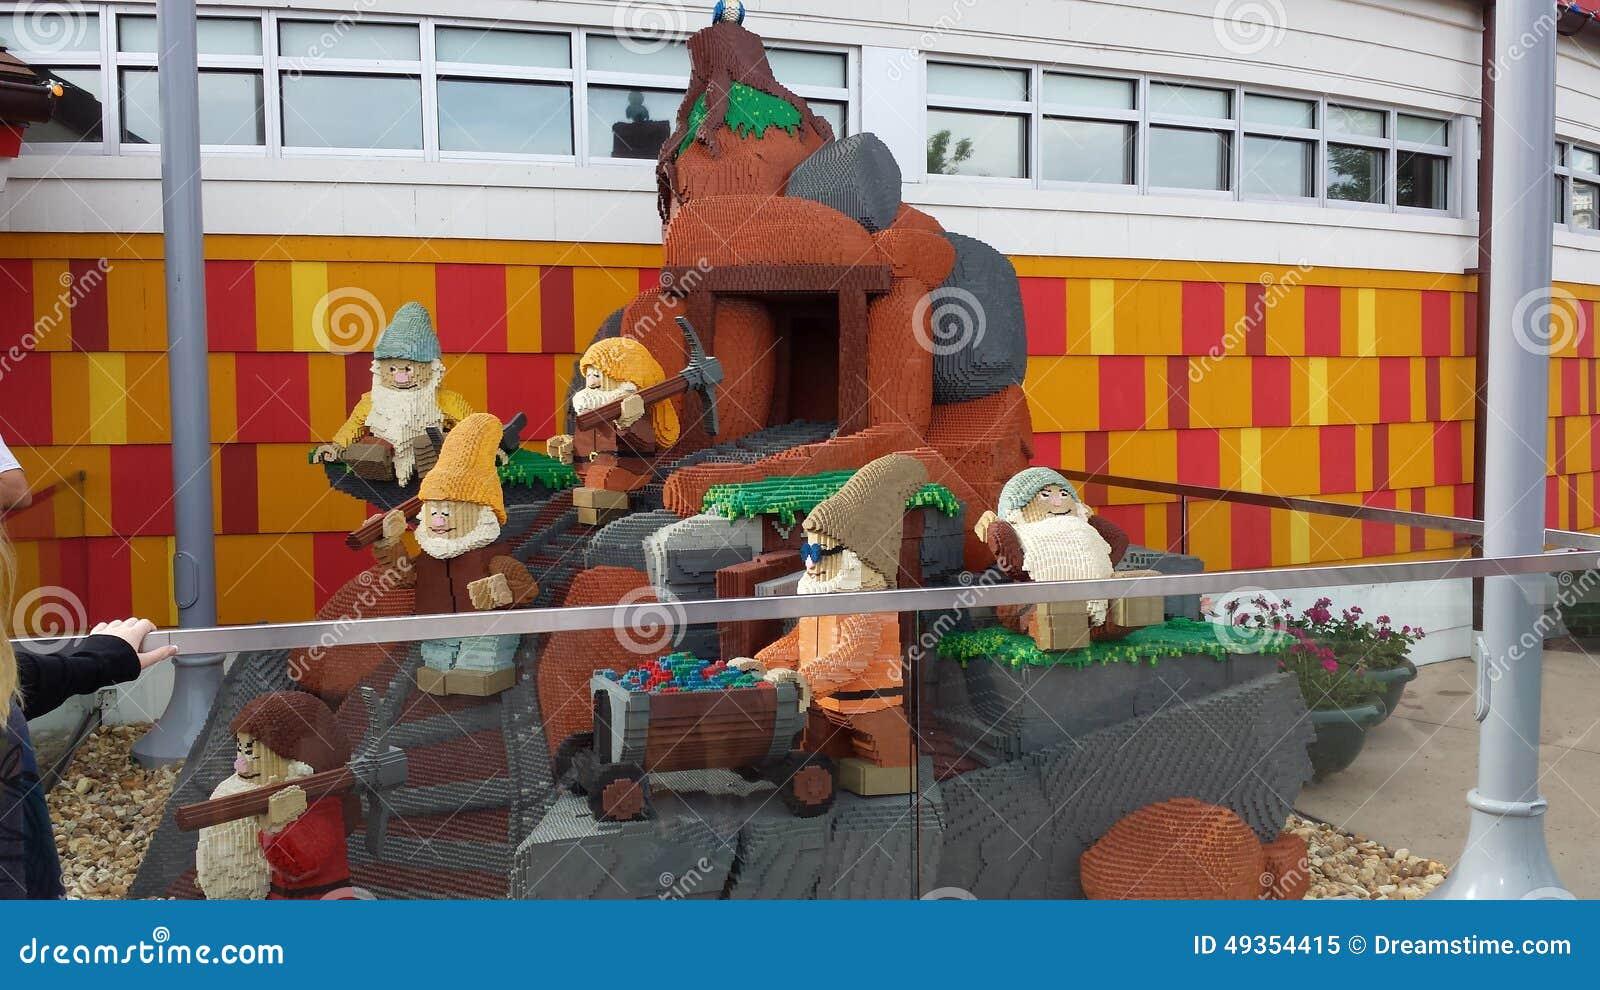 7 nains lego sculpture image ditorial image du nains 49354415. Black Bedroom Furniture Sets. Home Design Ideas